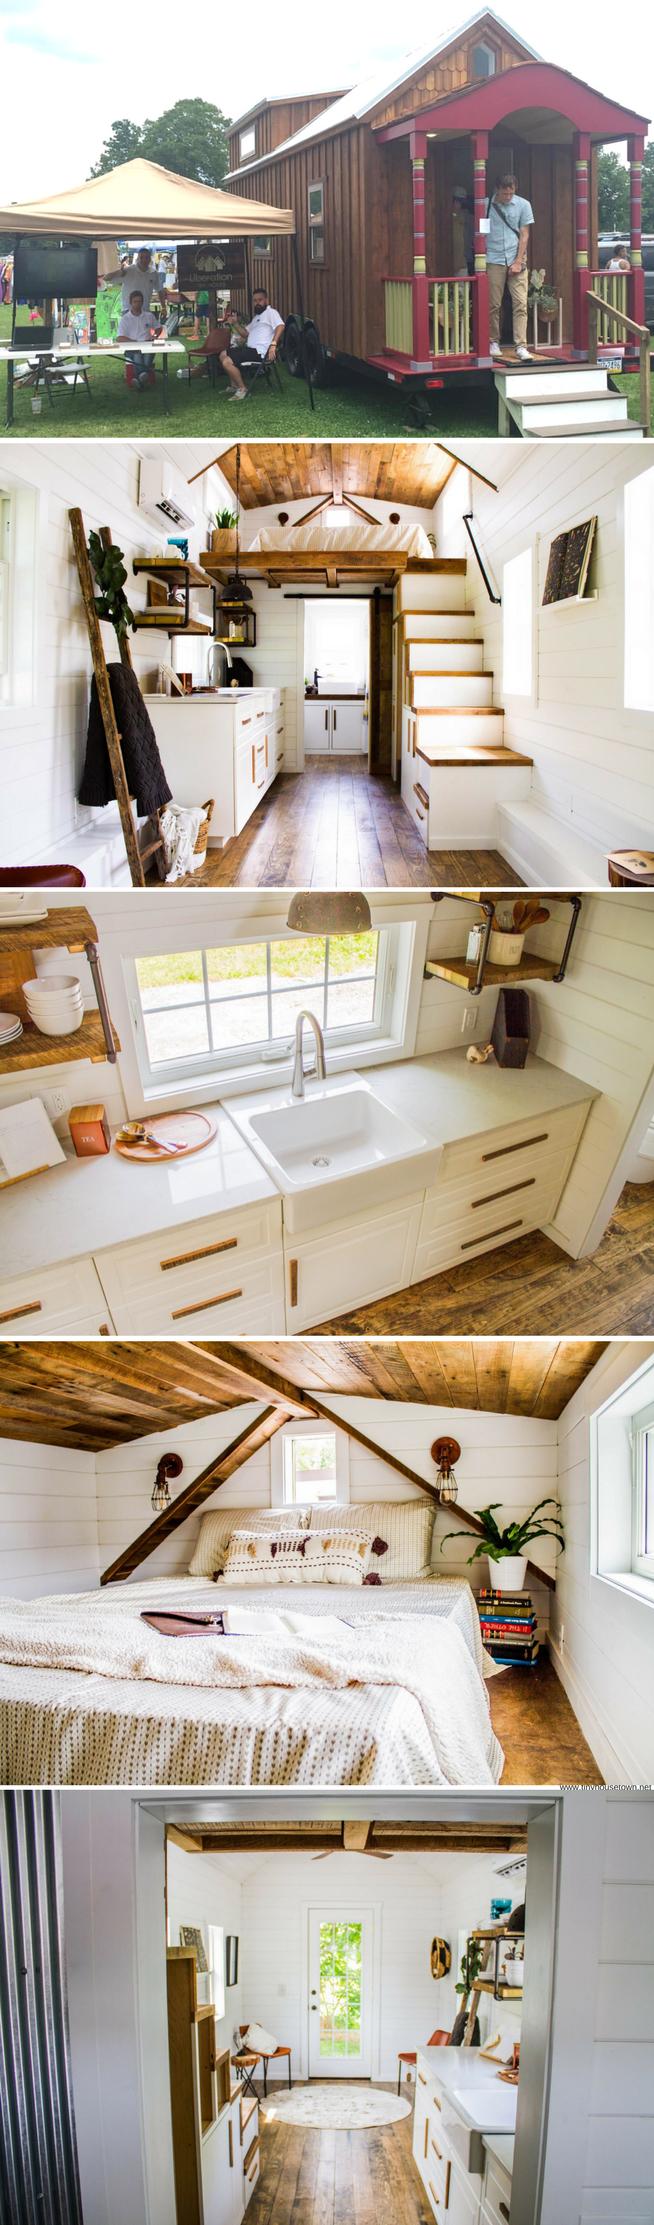 A beautiful farmhouse on wheels from Liberation Tiny Homes! | Minhas ...